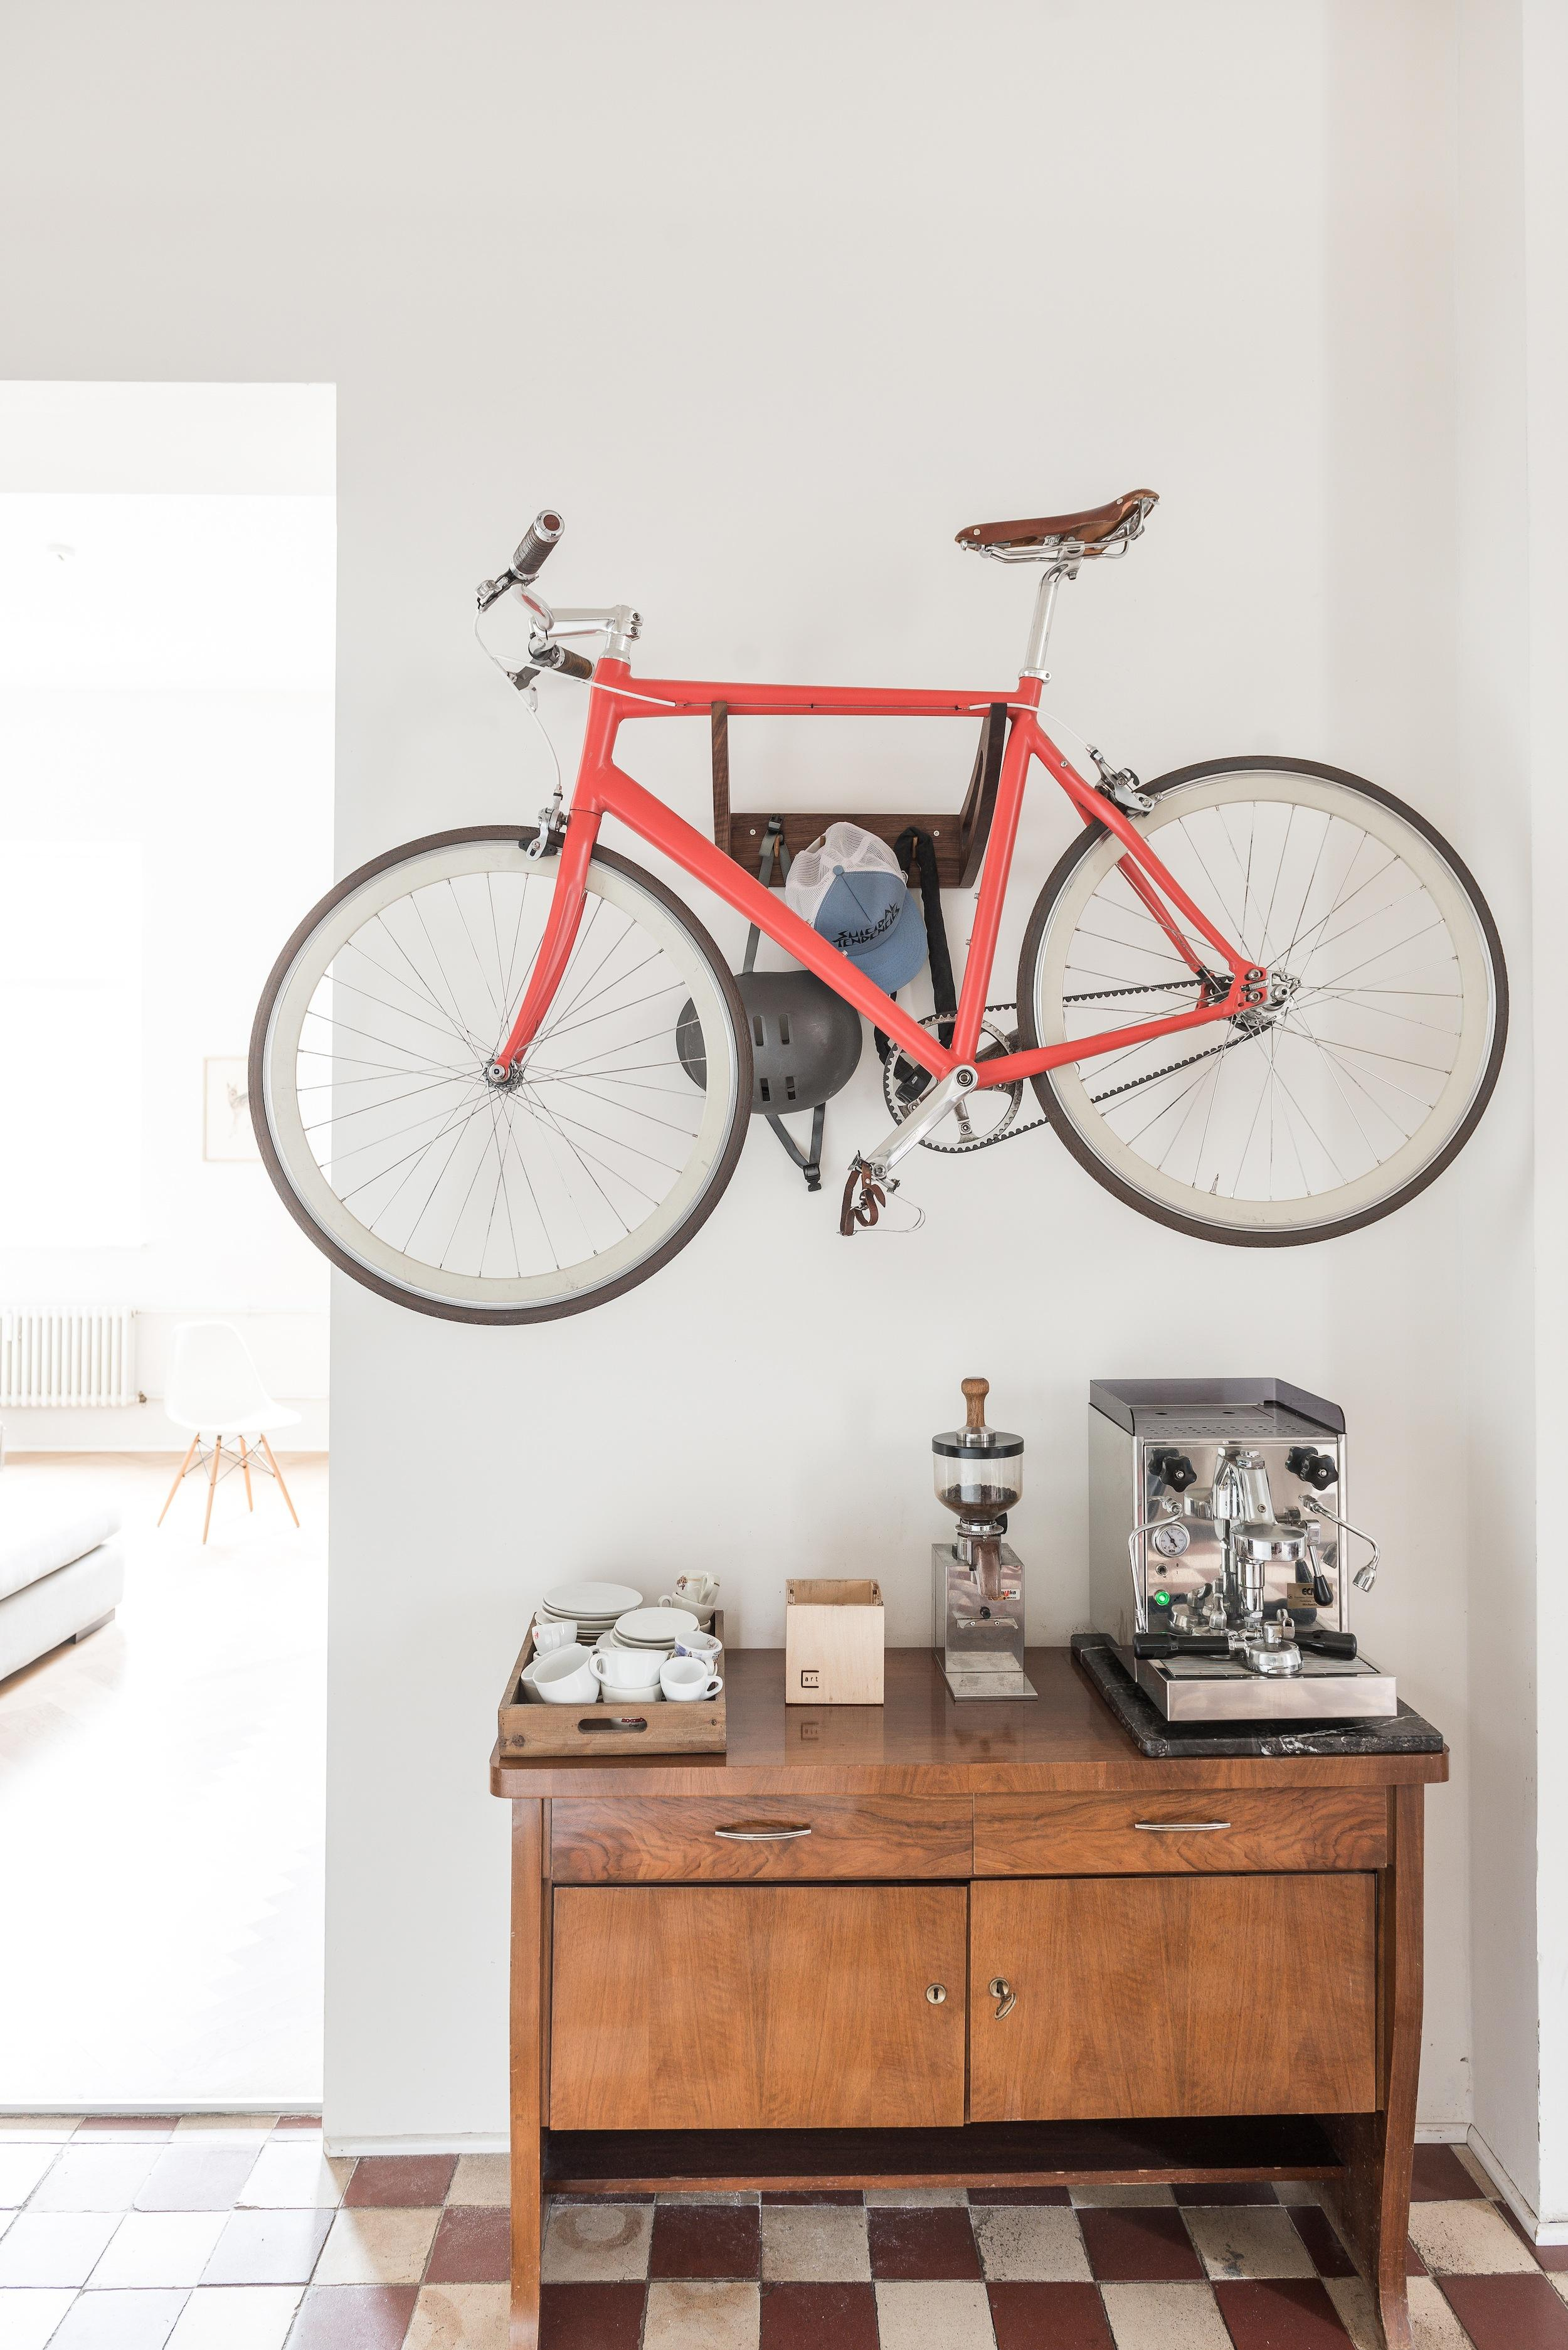 fahrradaufh ngung bilder ideen couchstyle. Black Bedroom Furniture Sets. Home Design Ideas